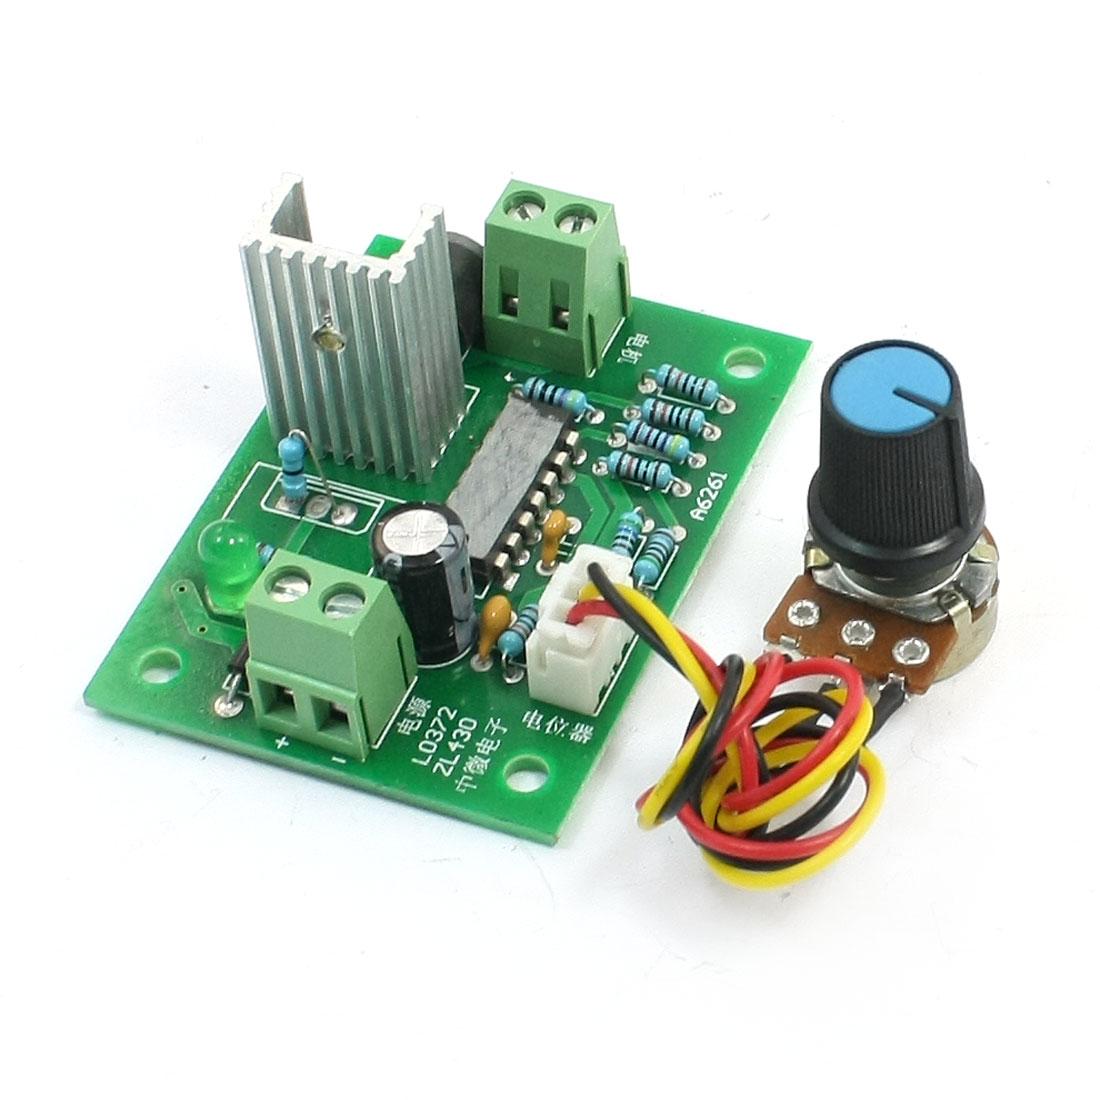 Pulse Width Modulation DC Speed Control Switch 6V 12V 24V 100W